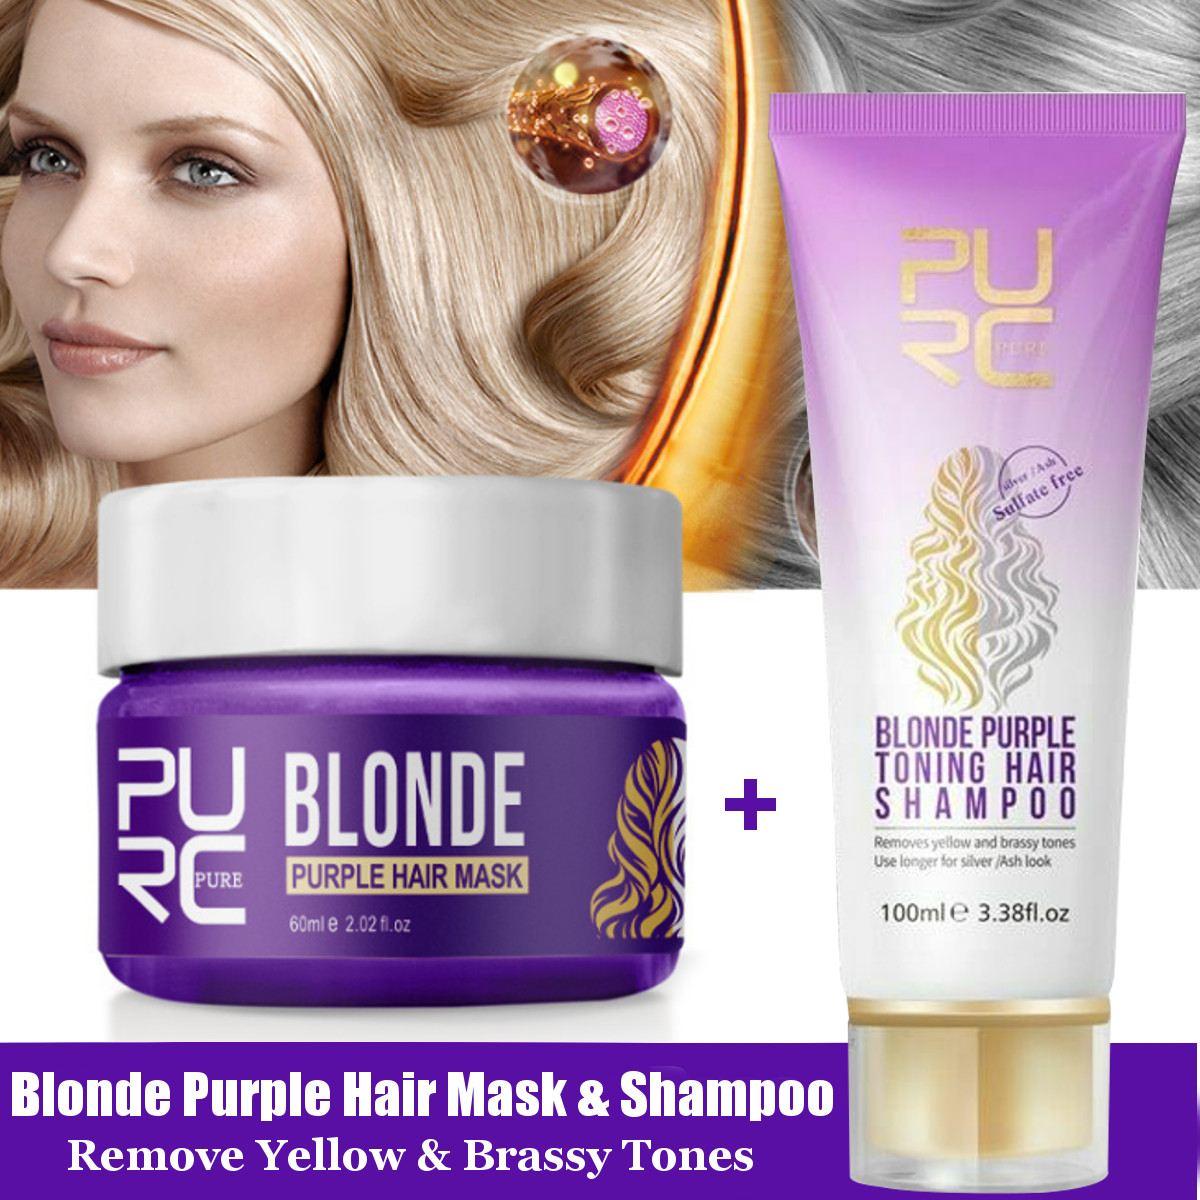 PURC-Máscara de champú de pelo púrpura, Rubio, remueve tonos amarillo y brillante para reparar cabello dañado con ceniza plateada